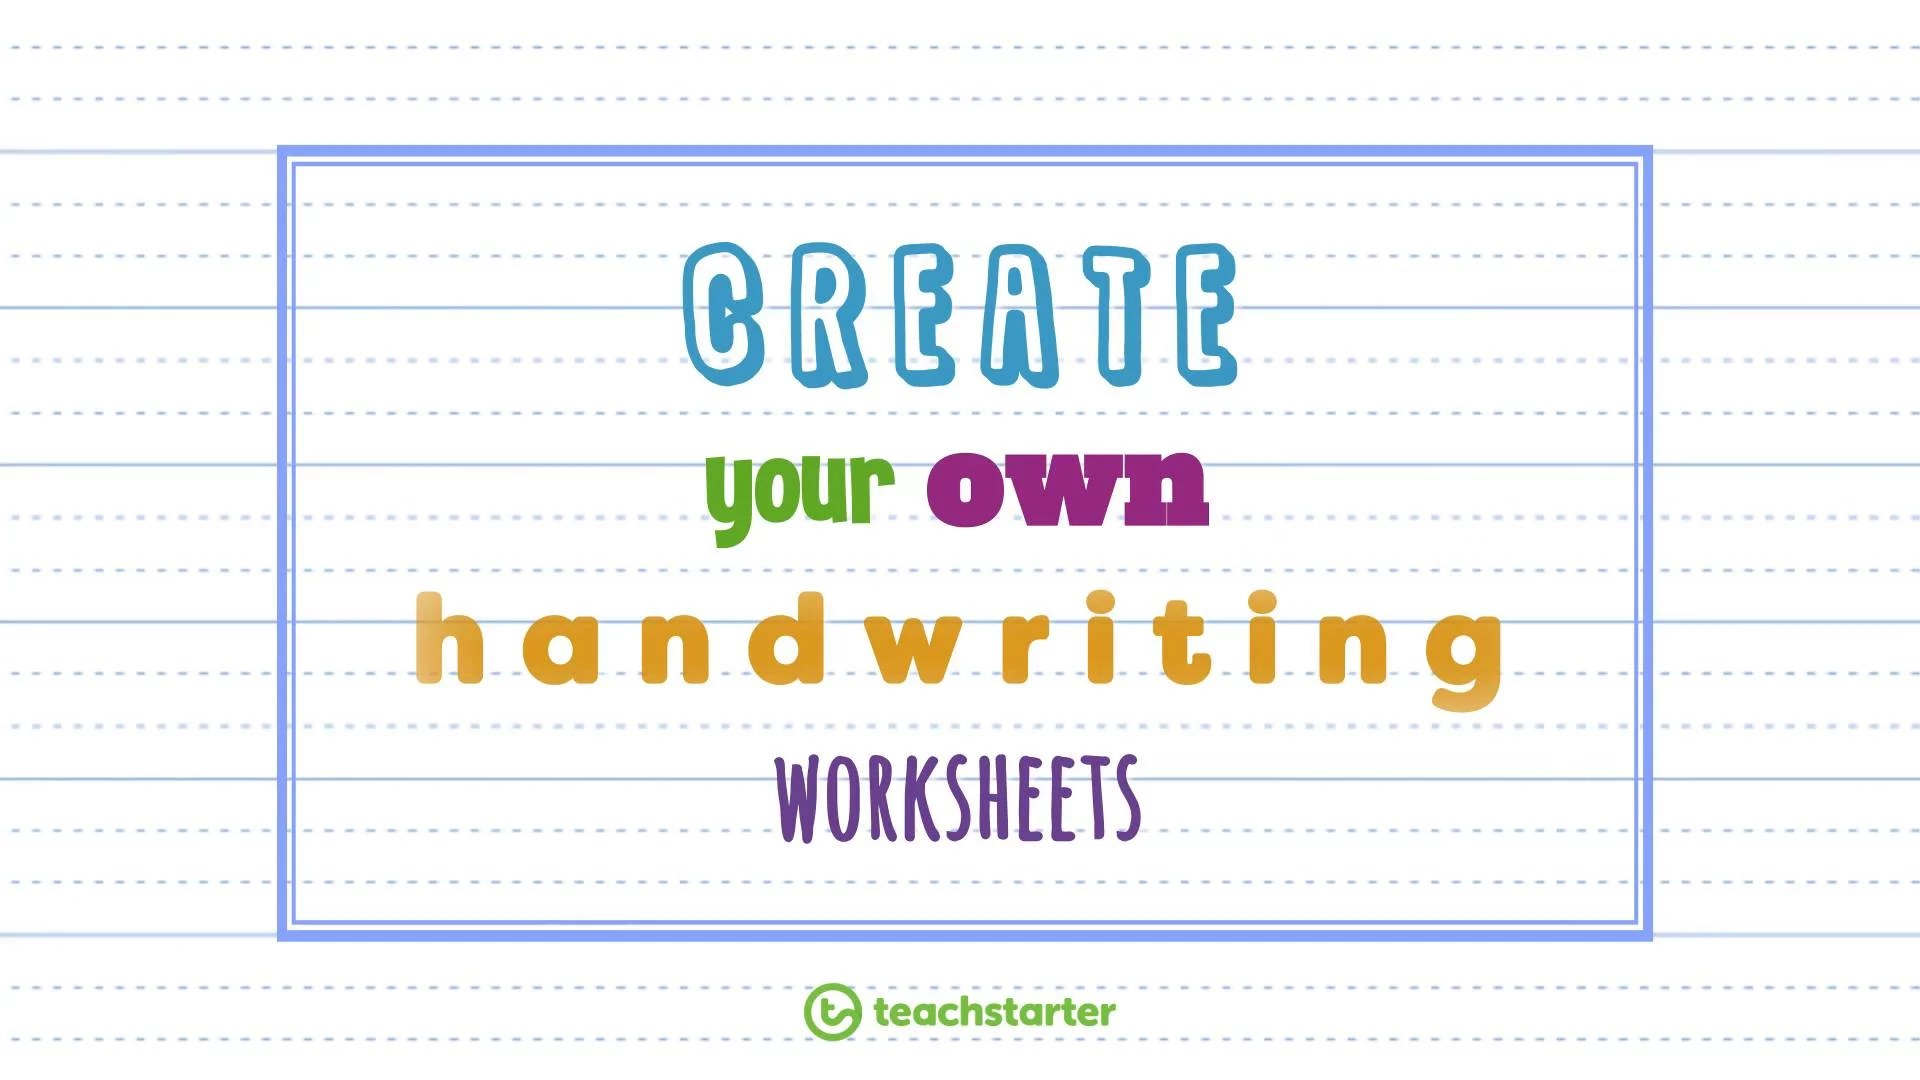 medium resolution of Create Your Own Handwriting Sheets Easily   Handwriting Generator